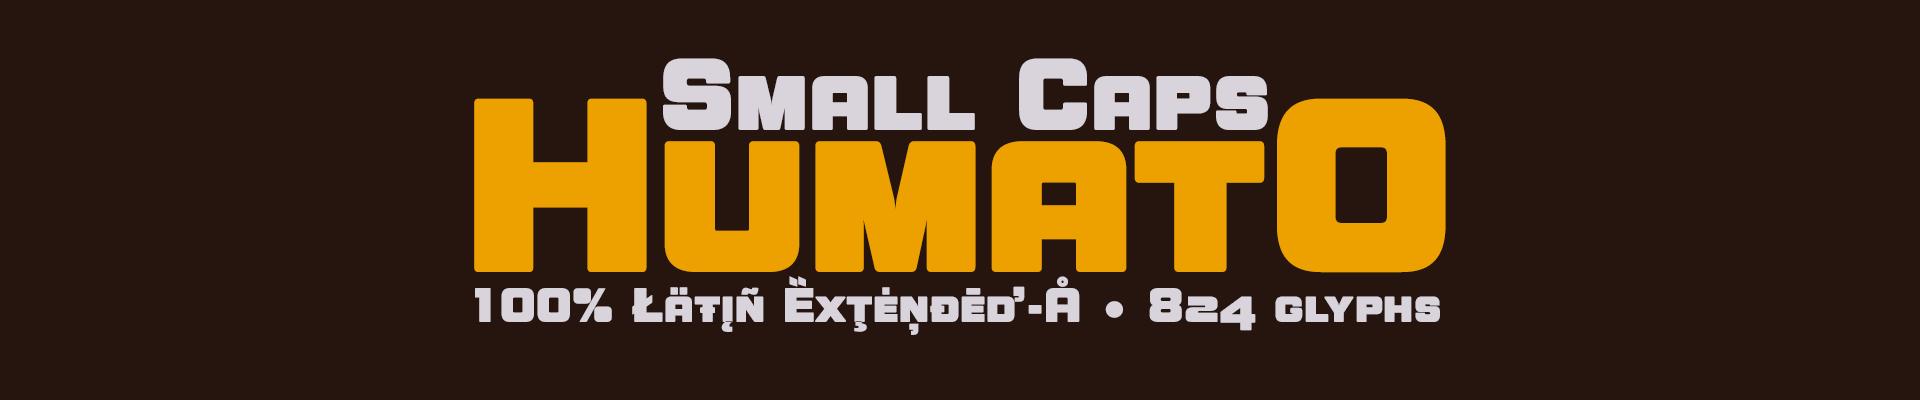 Humato Small Caps - 02 styles - OpenType Features